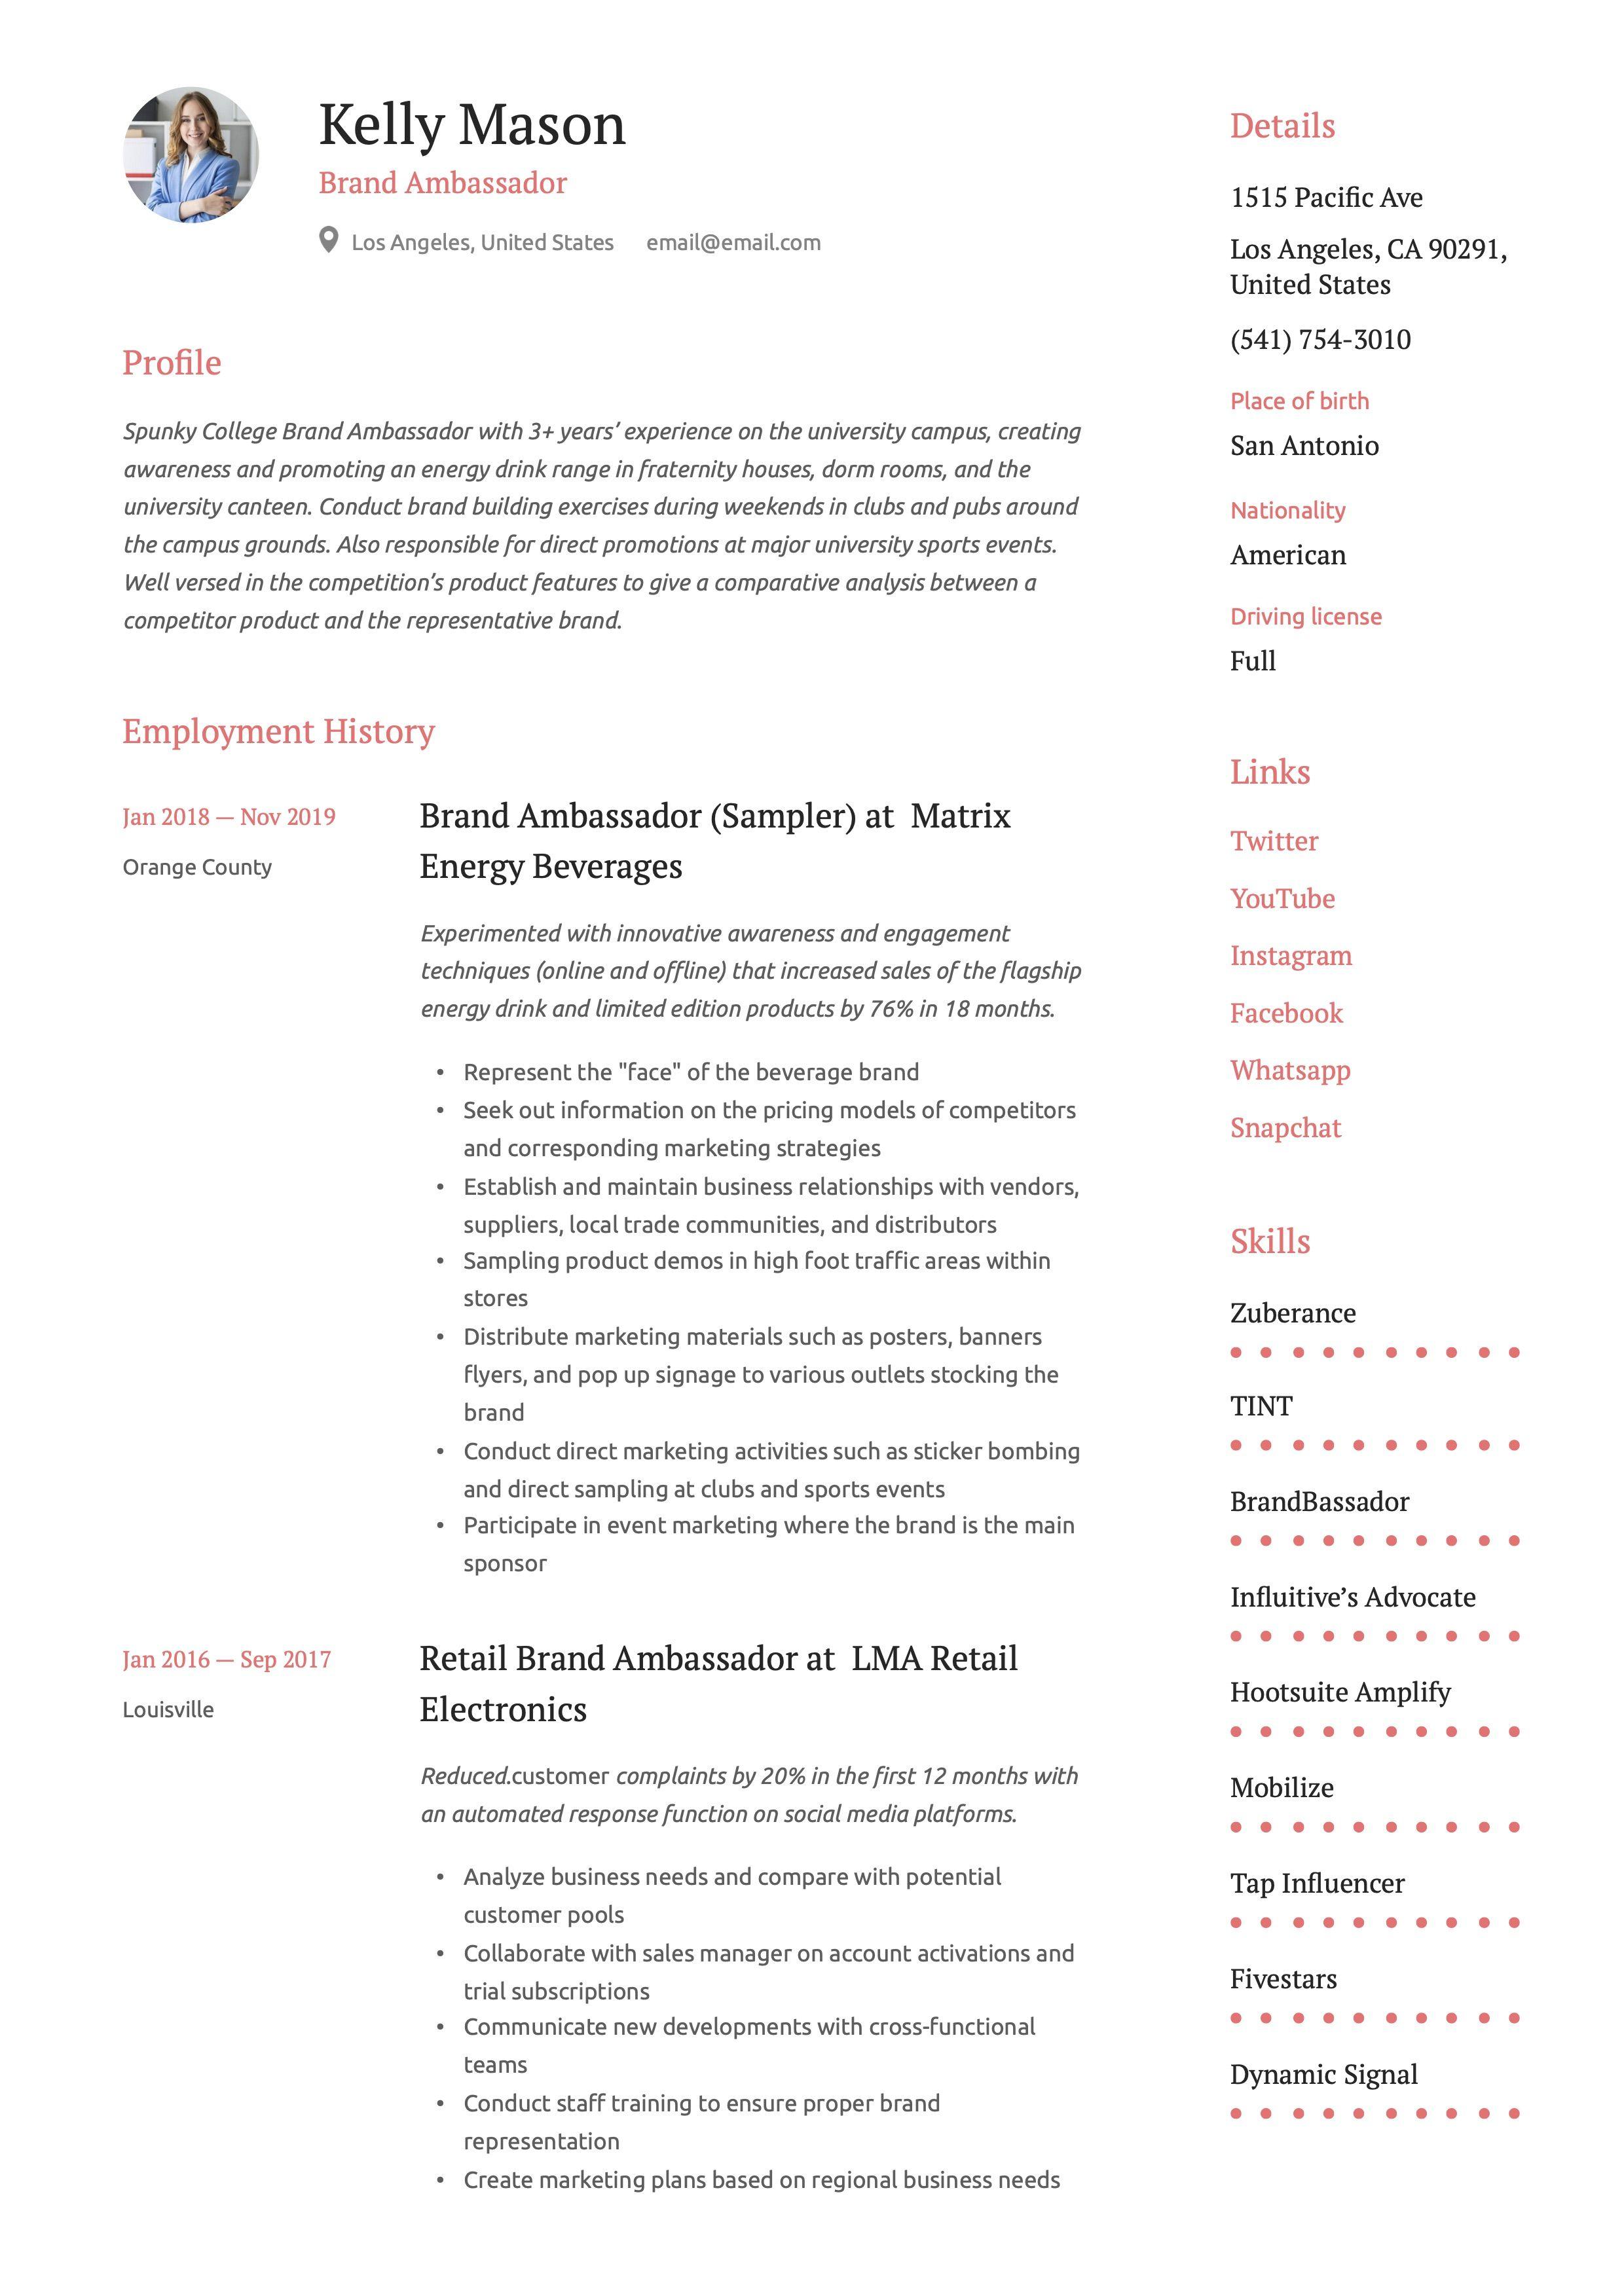 Pin on 12 Brand Ambassador Resume Templates